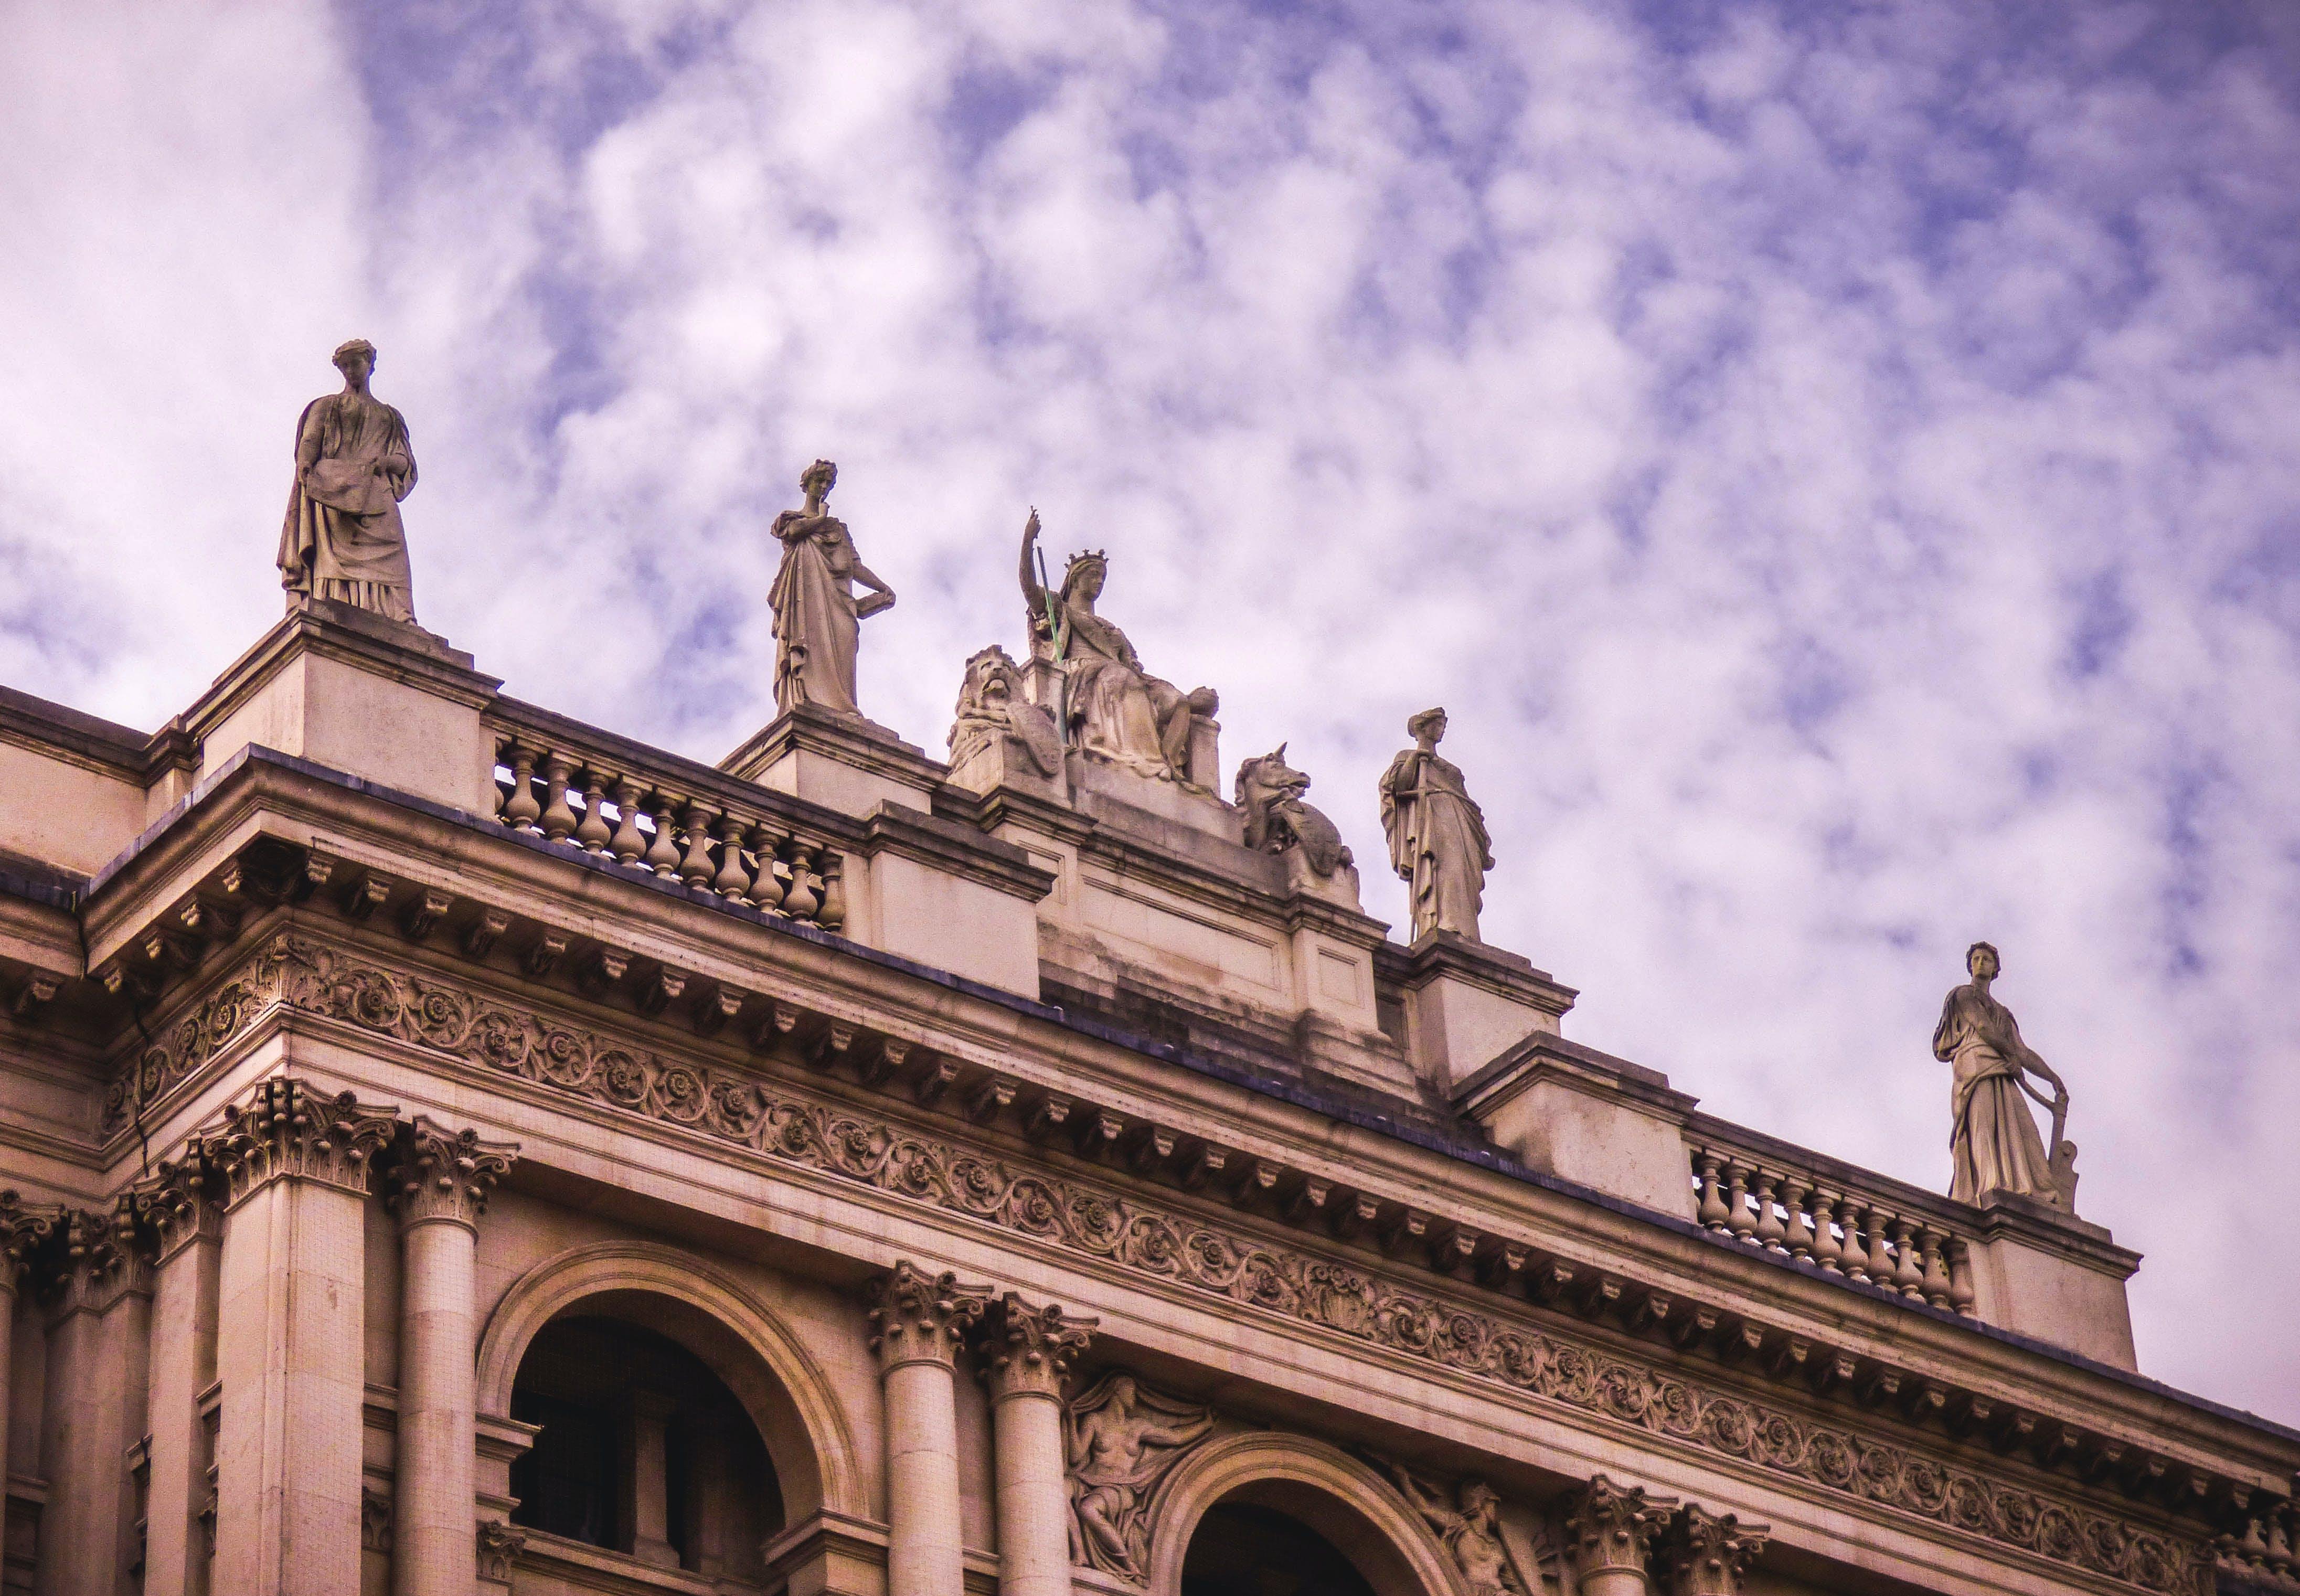 Gratis lagerfoto af arkitektdesign, arkitektonisk, arkitektur, barok